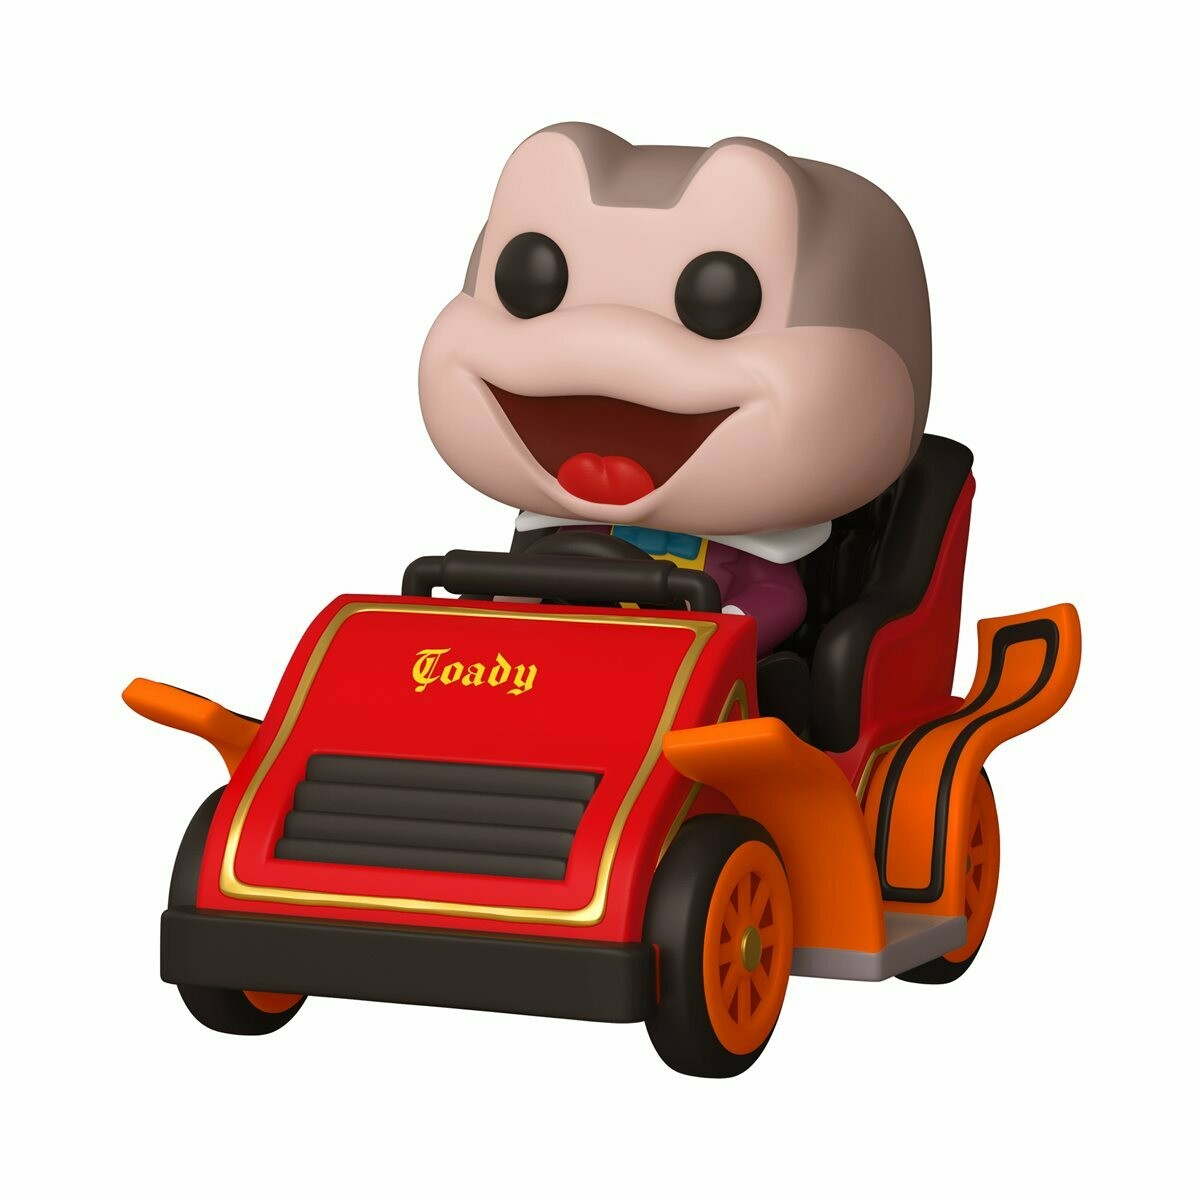 Funko Disneyland 65th Anniversary Mr. Toad in Car Pop! Vinyl Figure